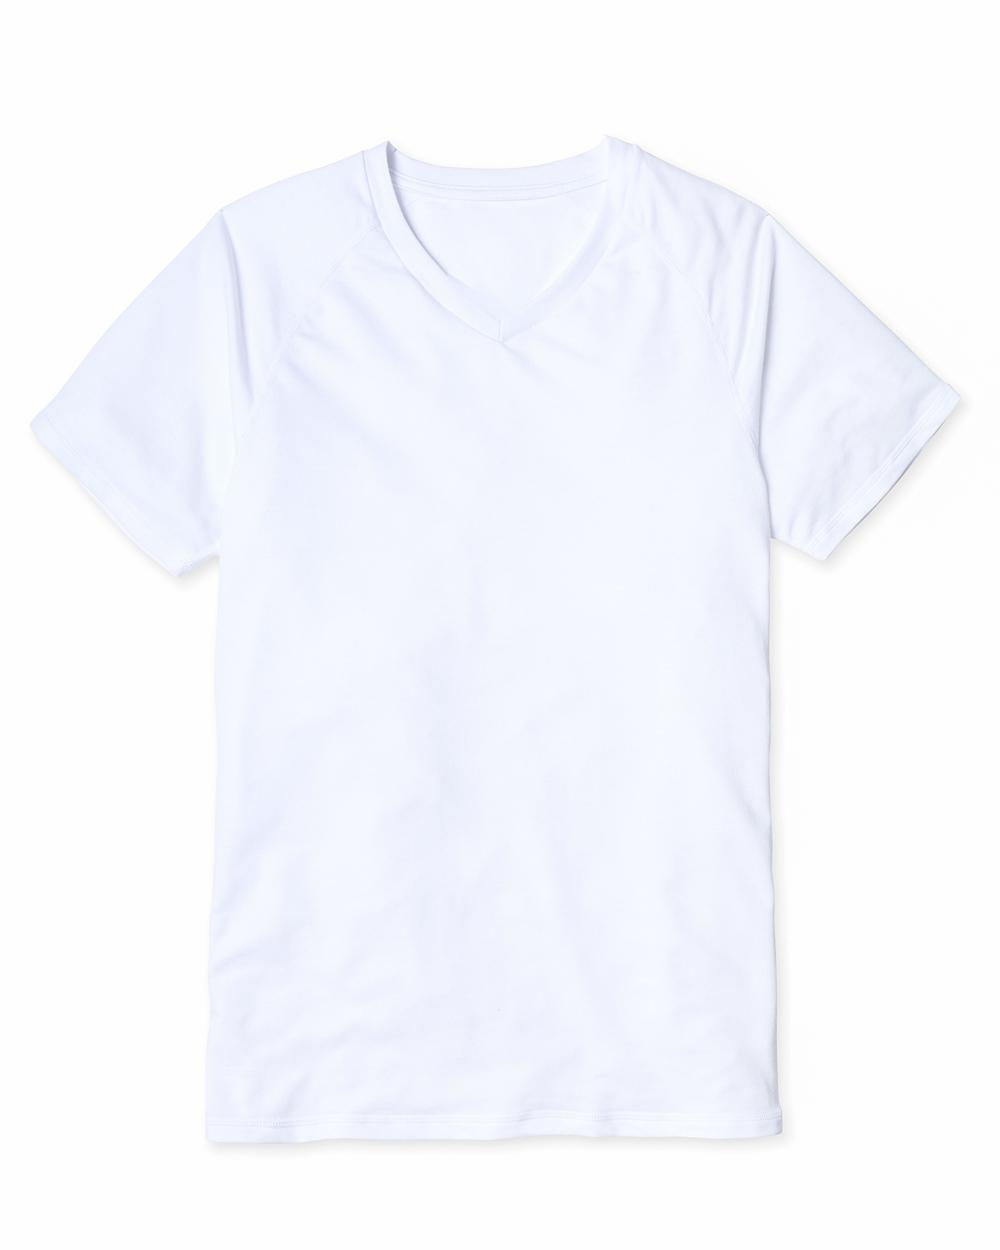 56aae9a99f Kit 5 Camisetas Gola V Masculina Lisa 100 Algodão Básica - Newbeat R  84